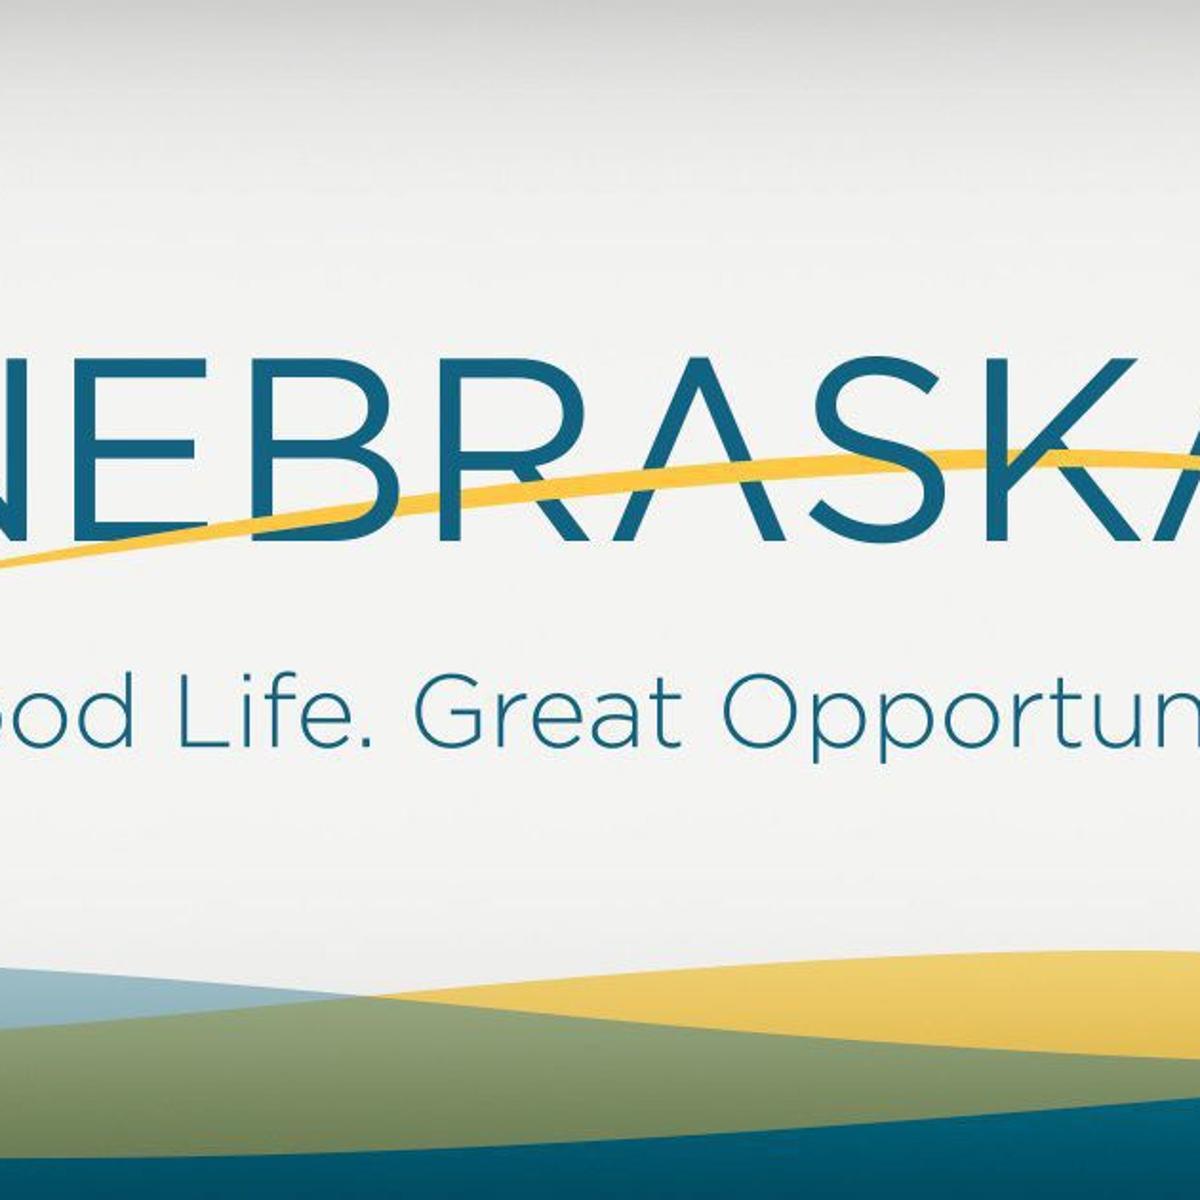 The Good Life,' again: Nebraska's new state brand brings